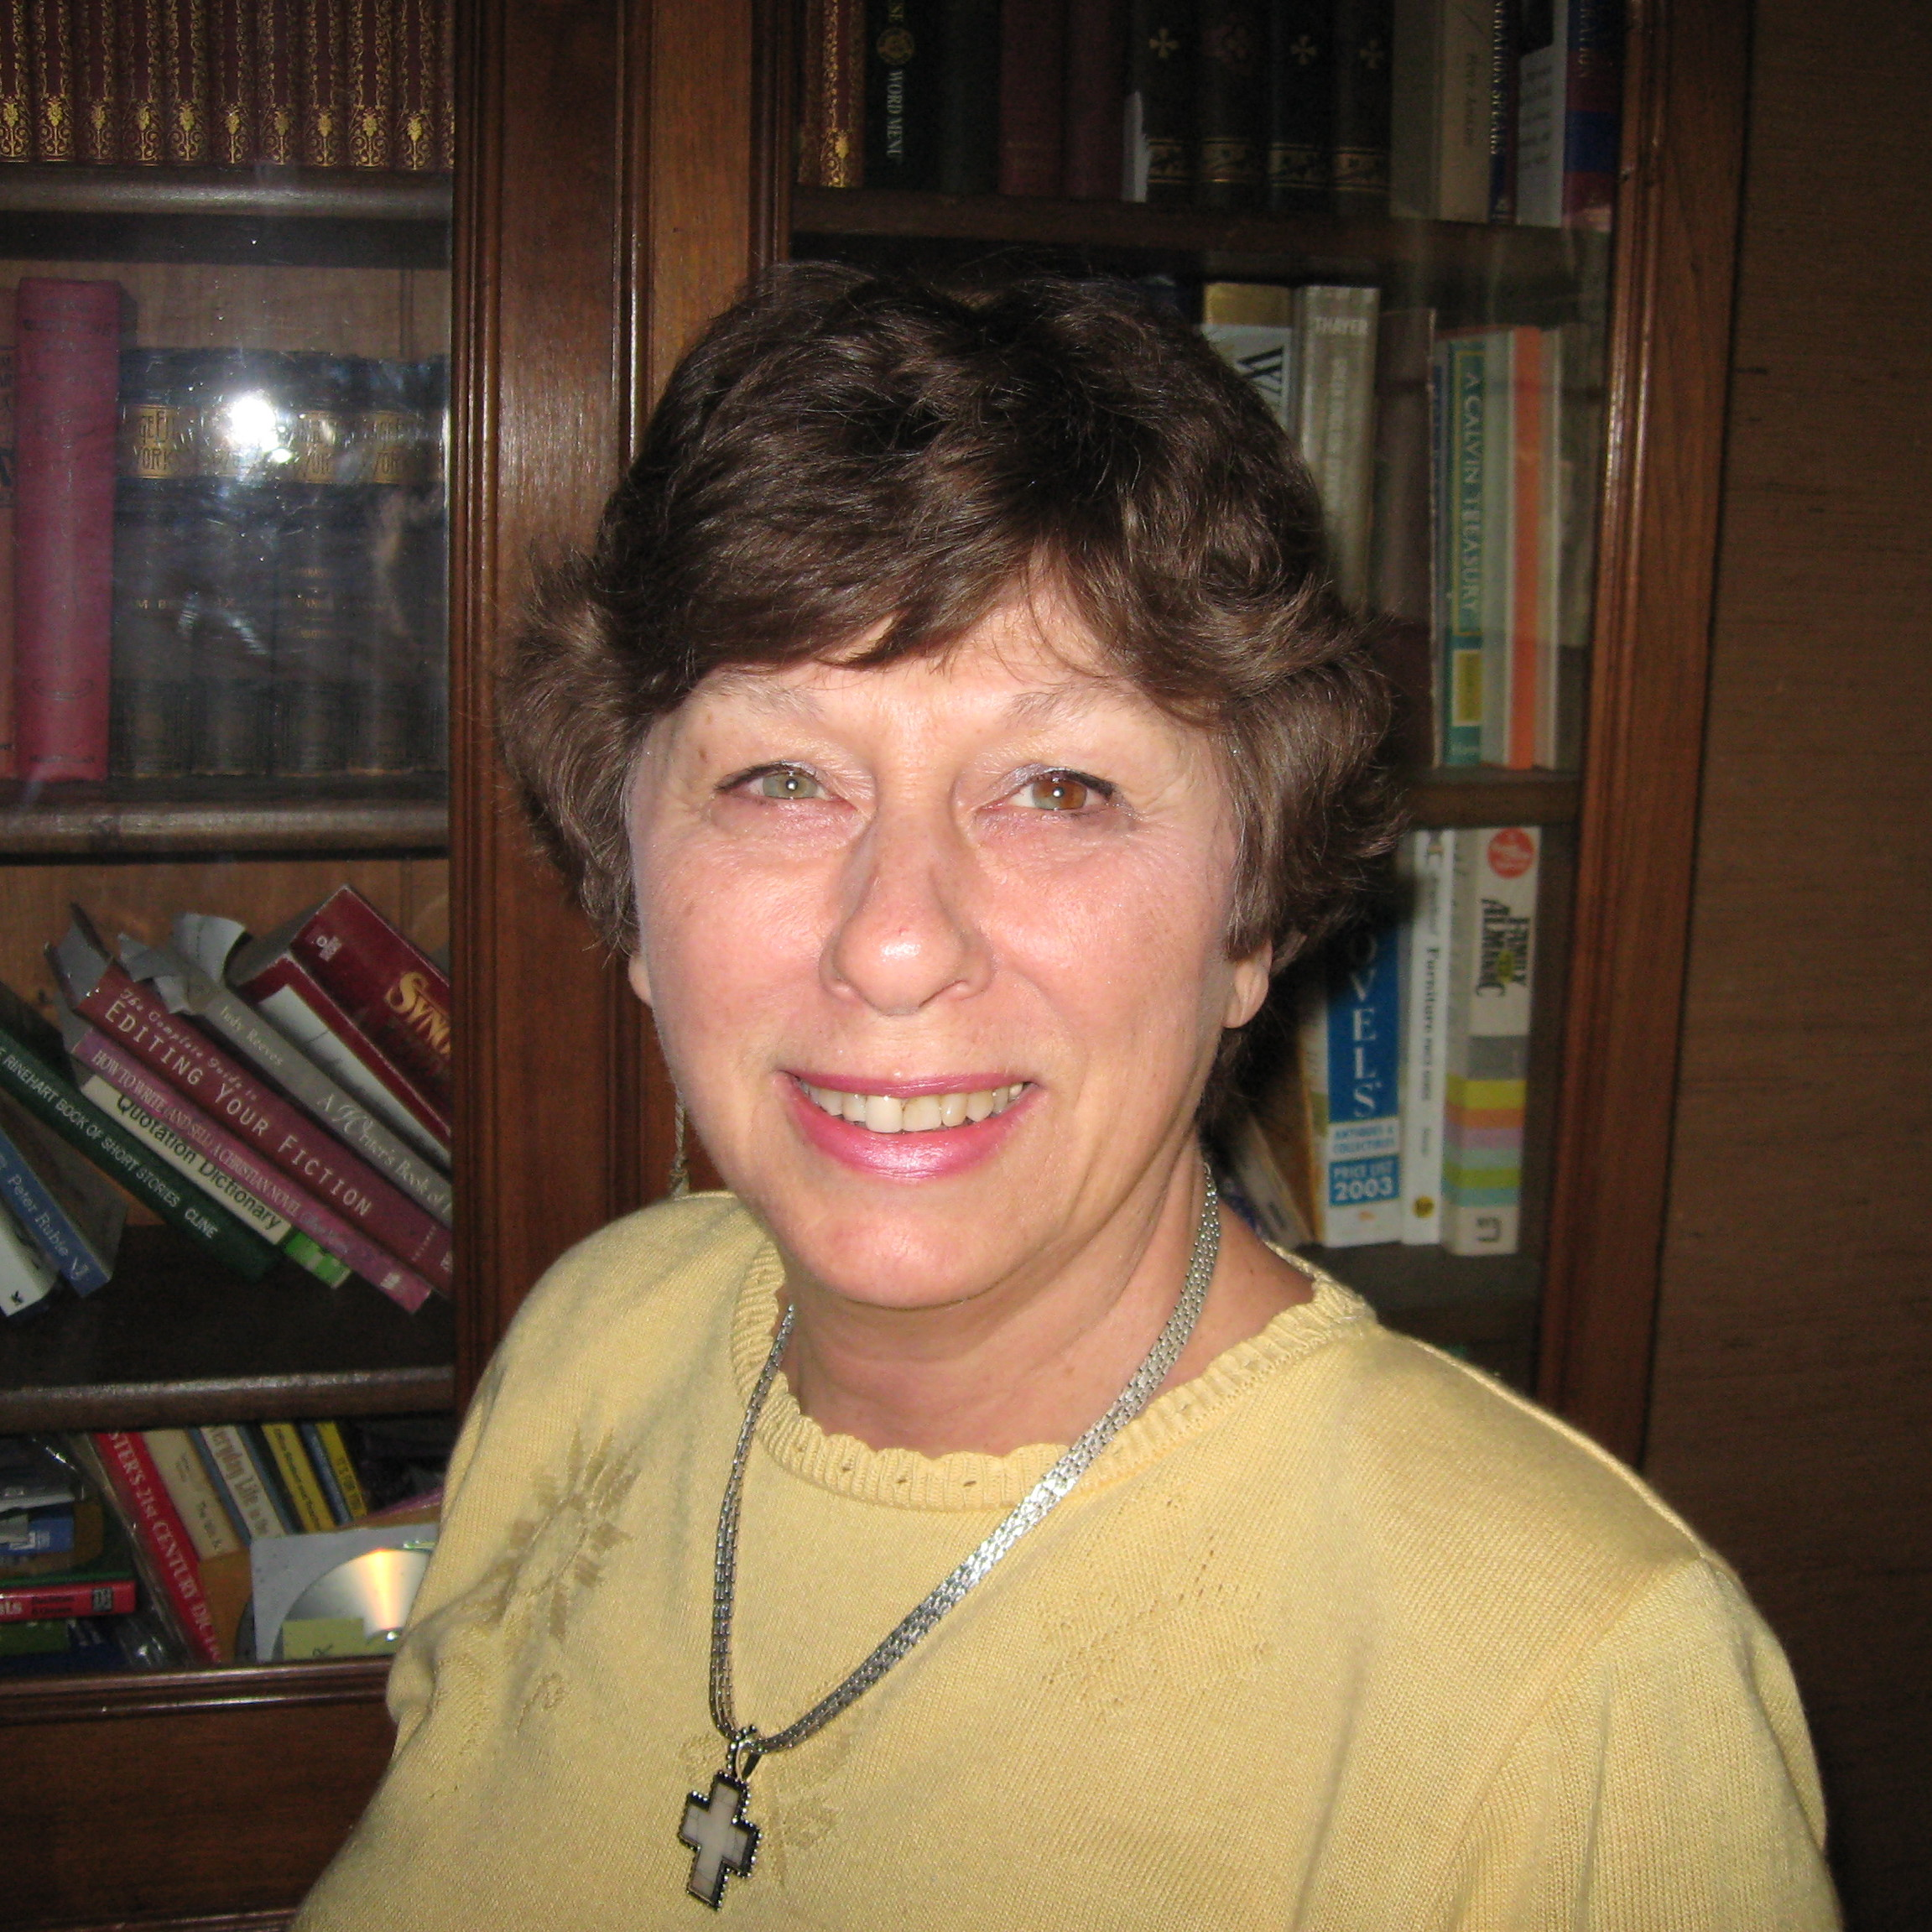 Sally Jadlow